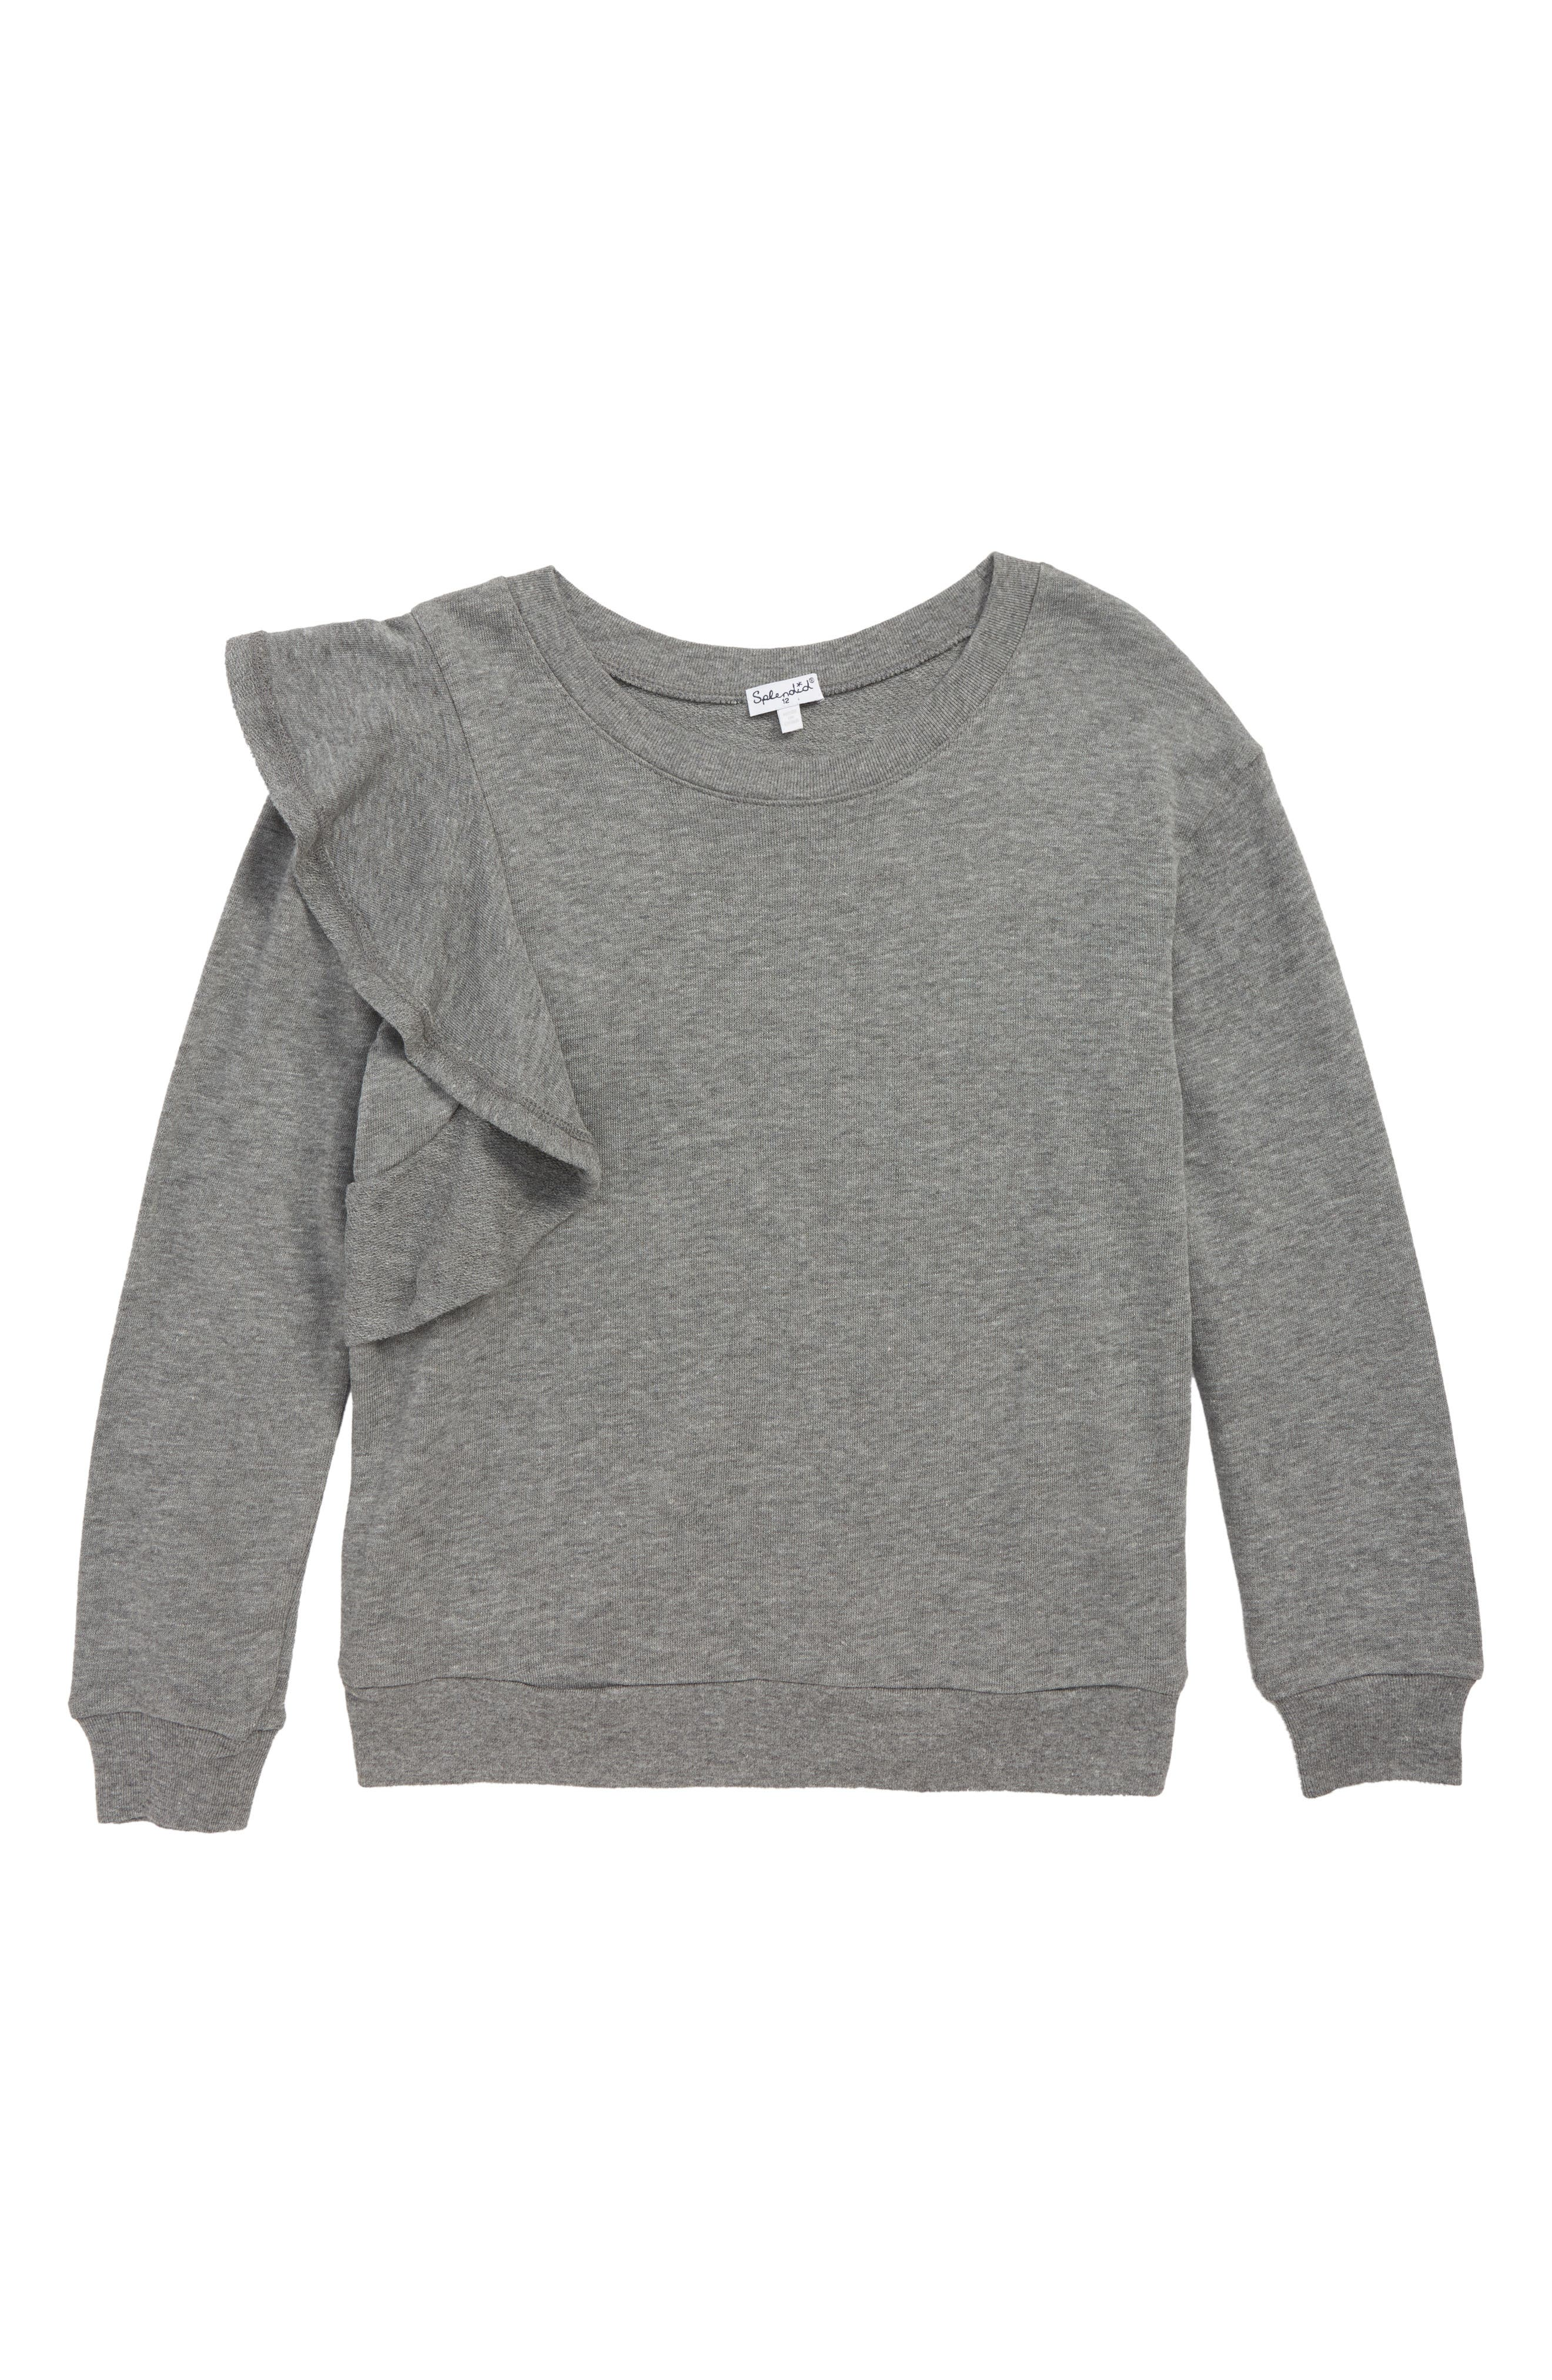 Ruffle Sweatshirt,                         Main,                         color, 020